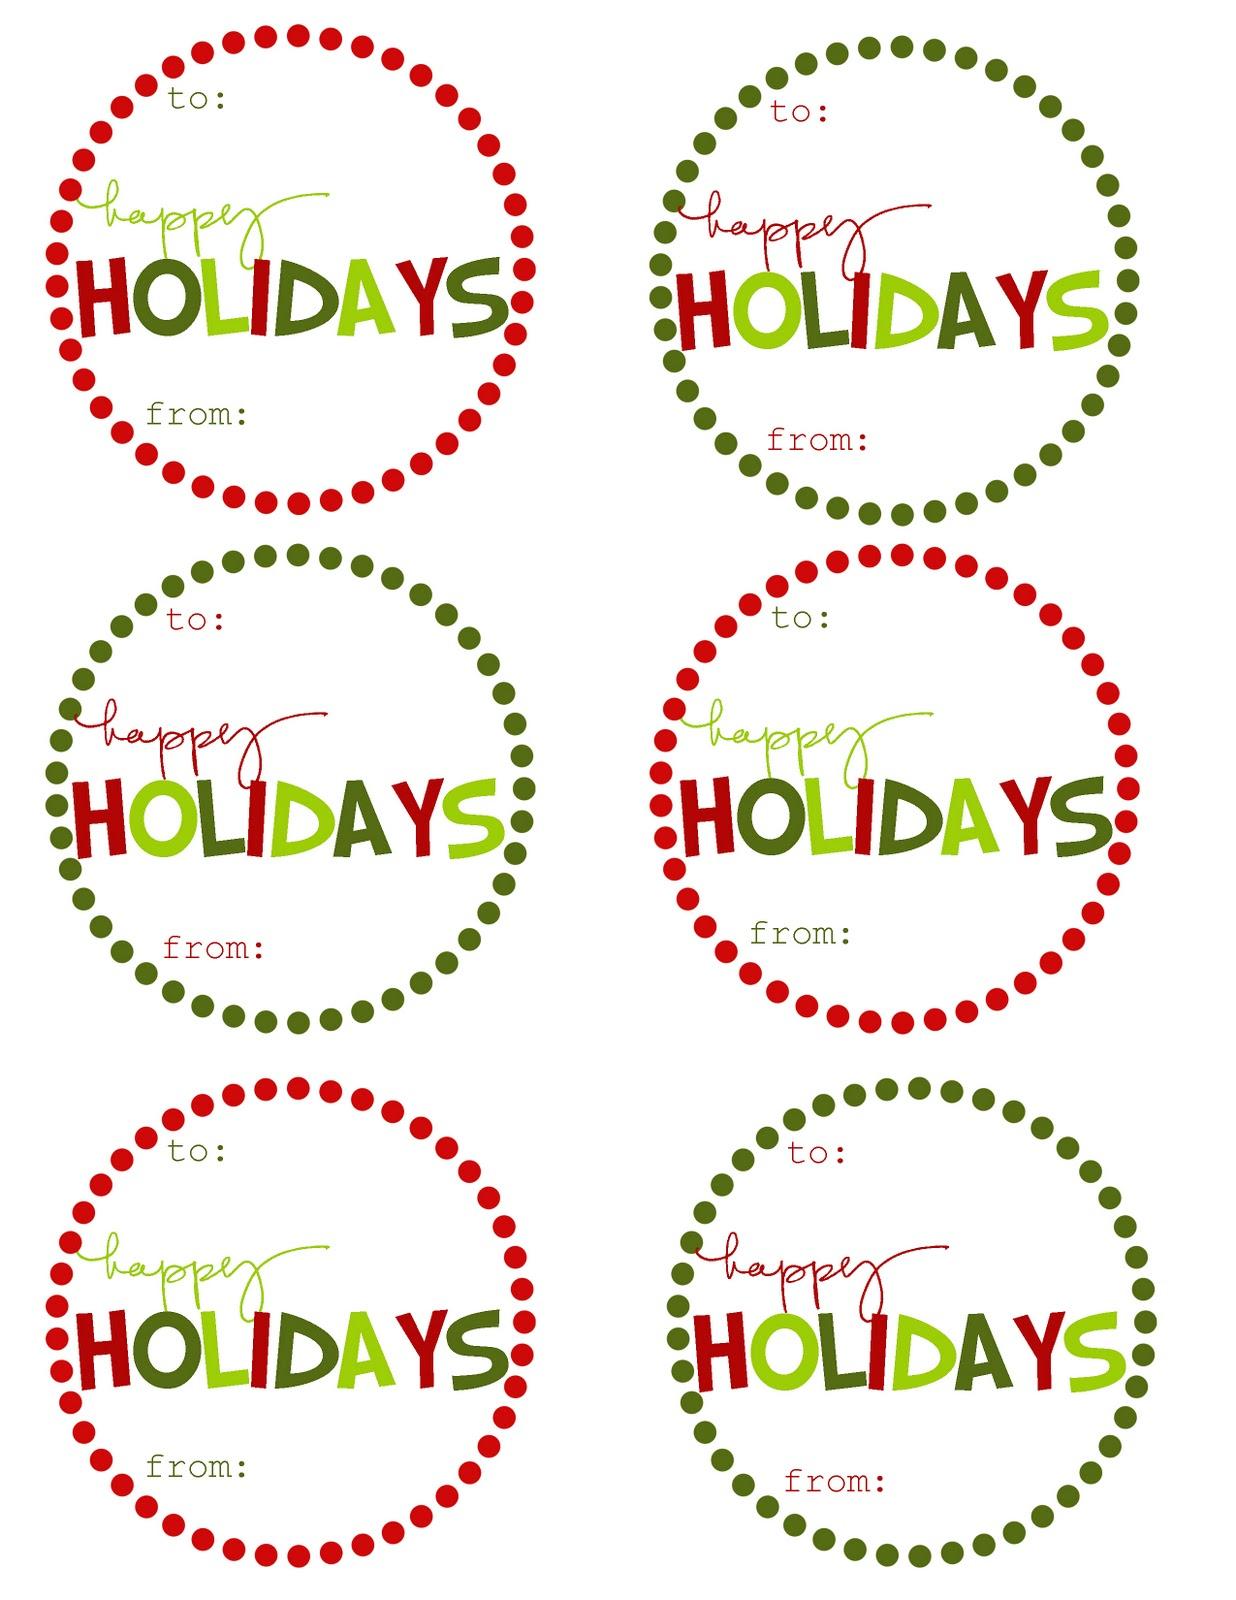 Mommyday Crafternight: {Free Printable} Christmas Gift Tags - Free Printable Happy Holidays Gift Tags